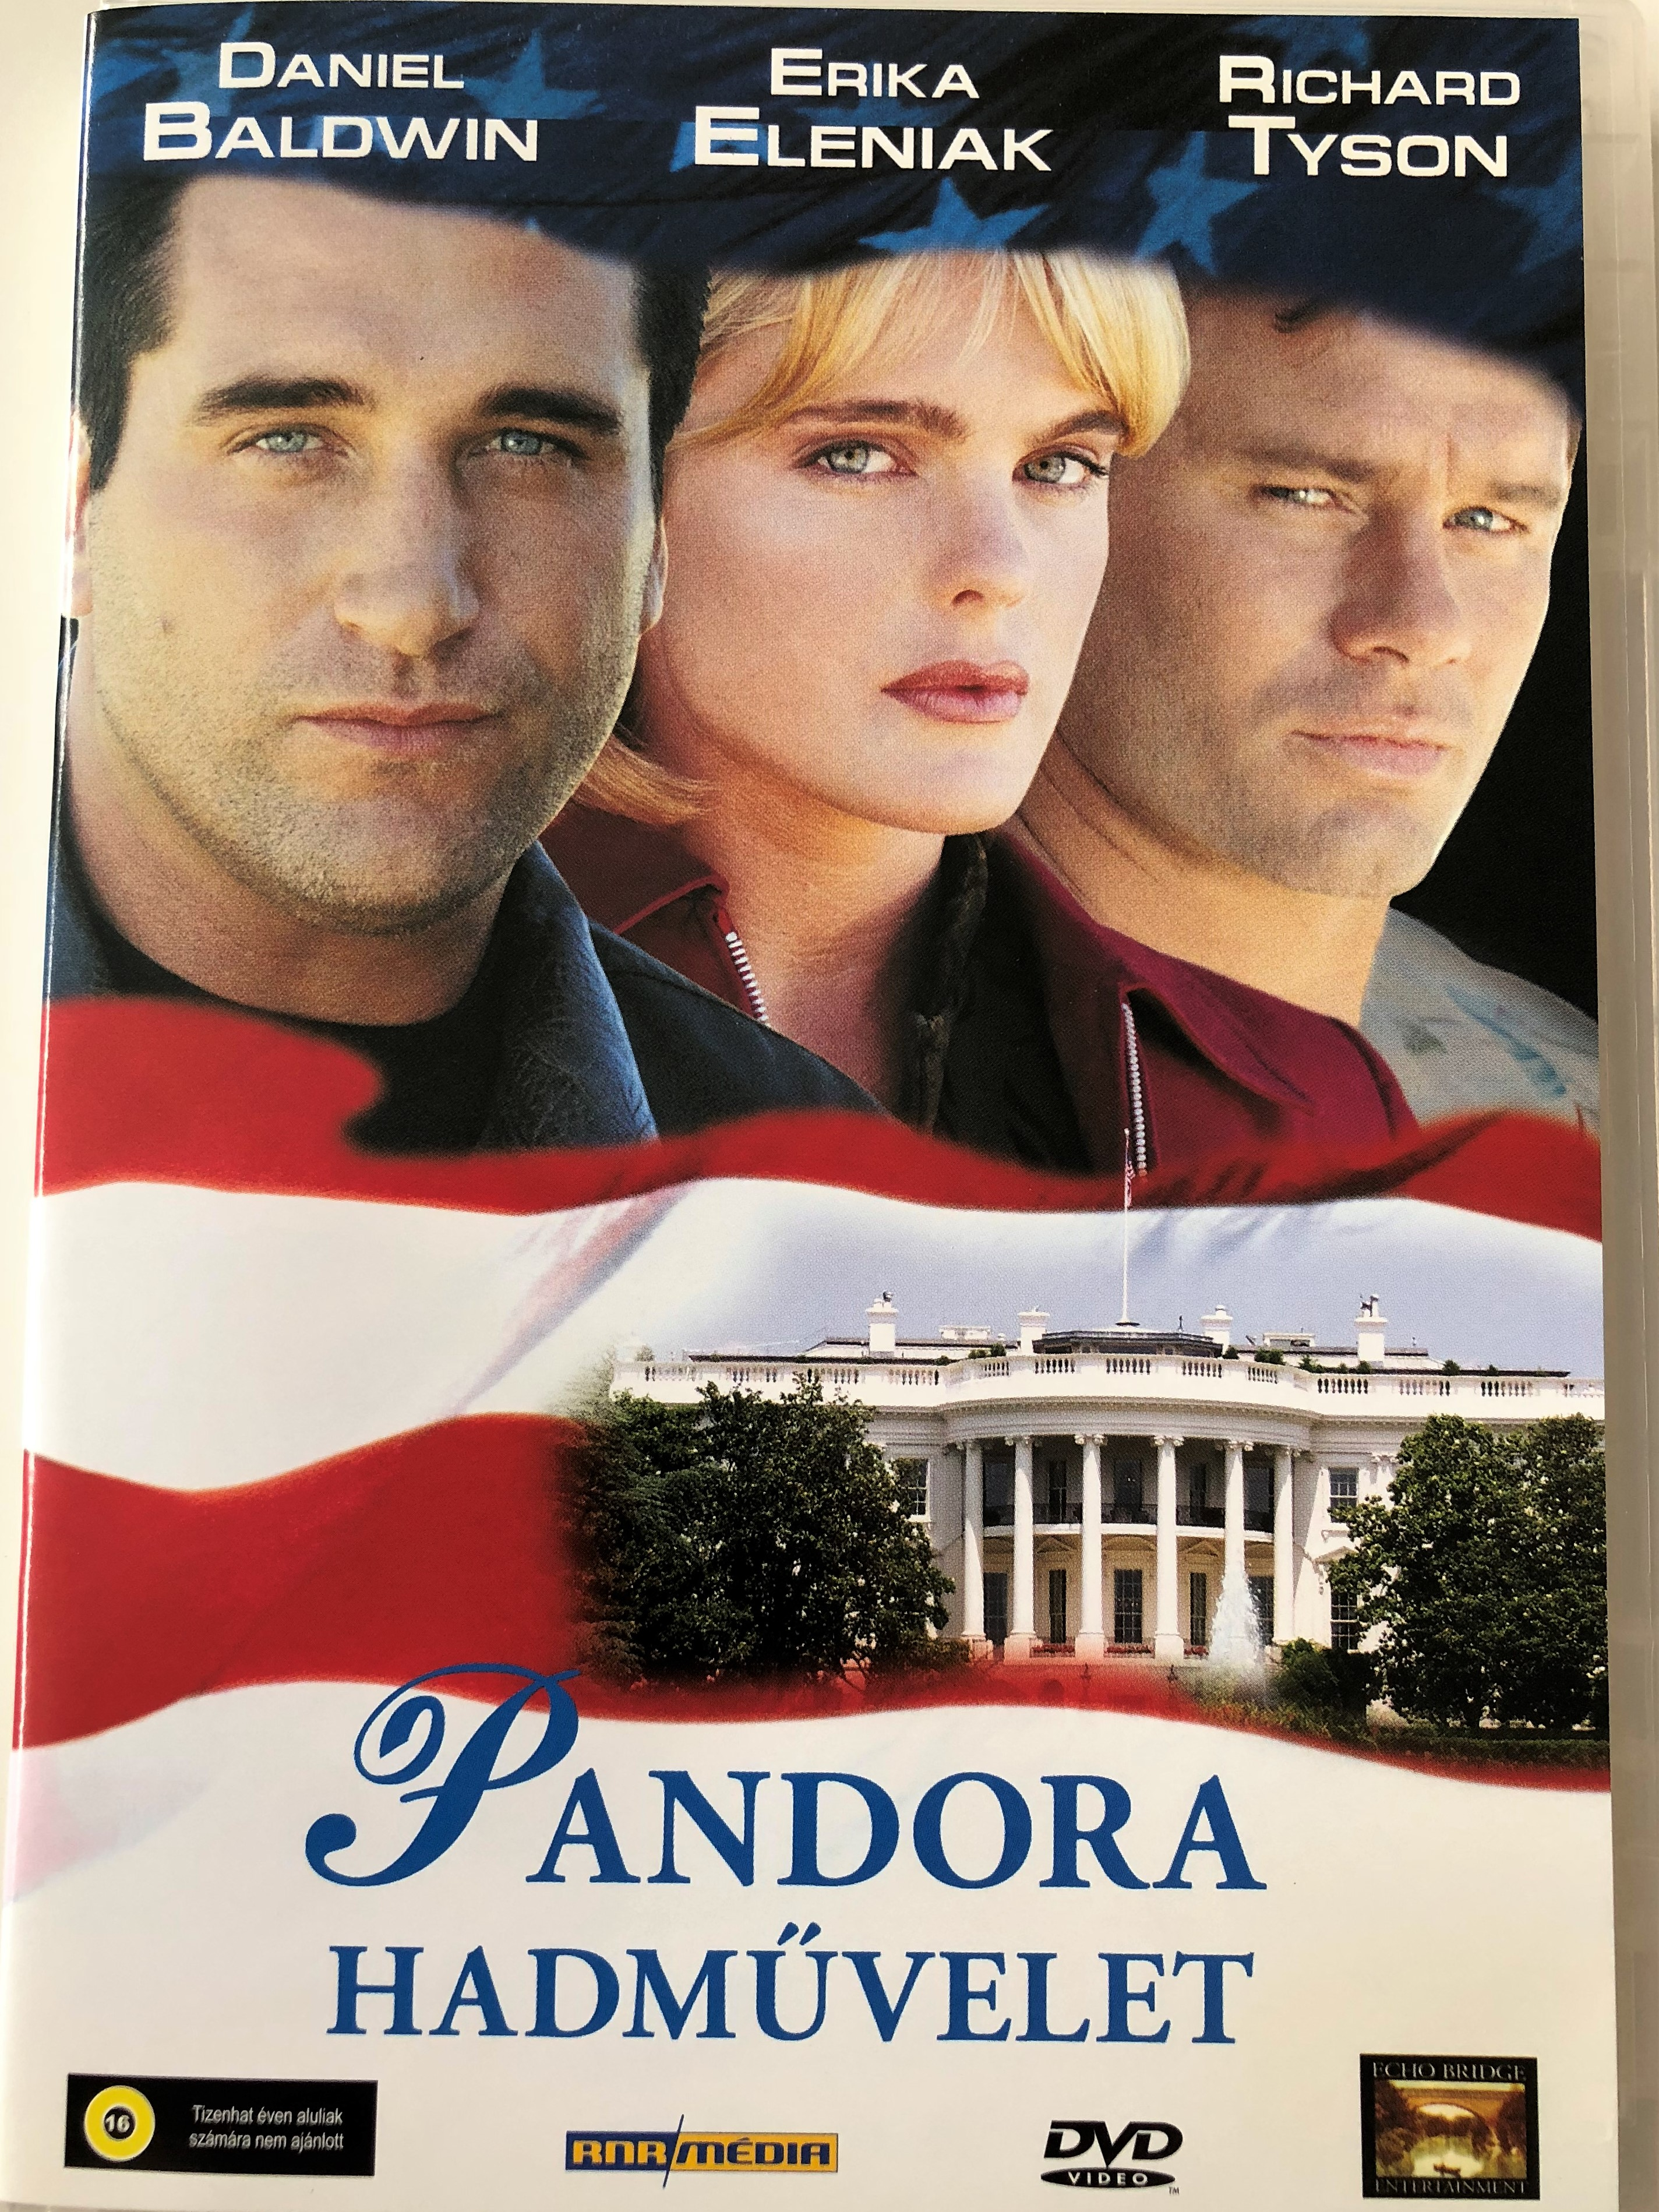 the-pandora-project-dvd-1998-pandora-hadm-velet-directed-by-john-terlesky-jim-wynorski-starring-daniel-baldwin-erika-eleniak-richard-tyson-tony-todd-bo-jackson-jeff-yagher-1-.jpg